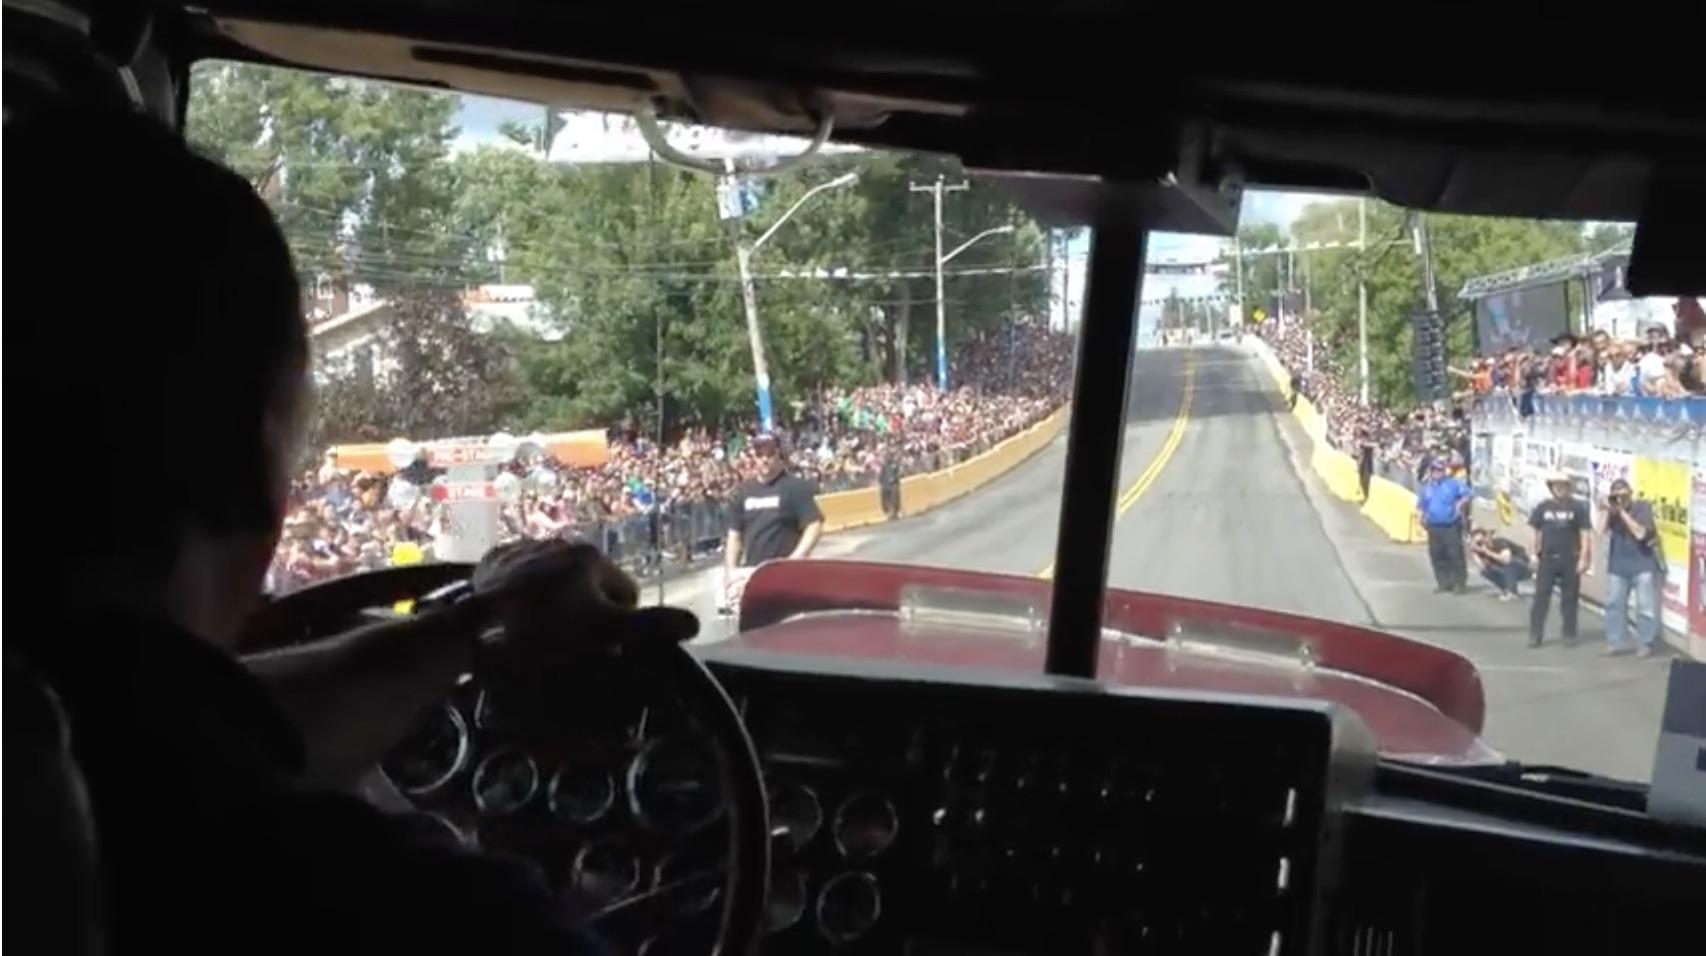 Hefty Turkey: Ride Along Inside Of A Peterbilt On A Run At The Rodéo du Camion Semi-Truck Races!